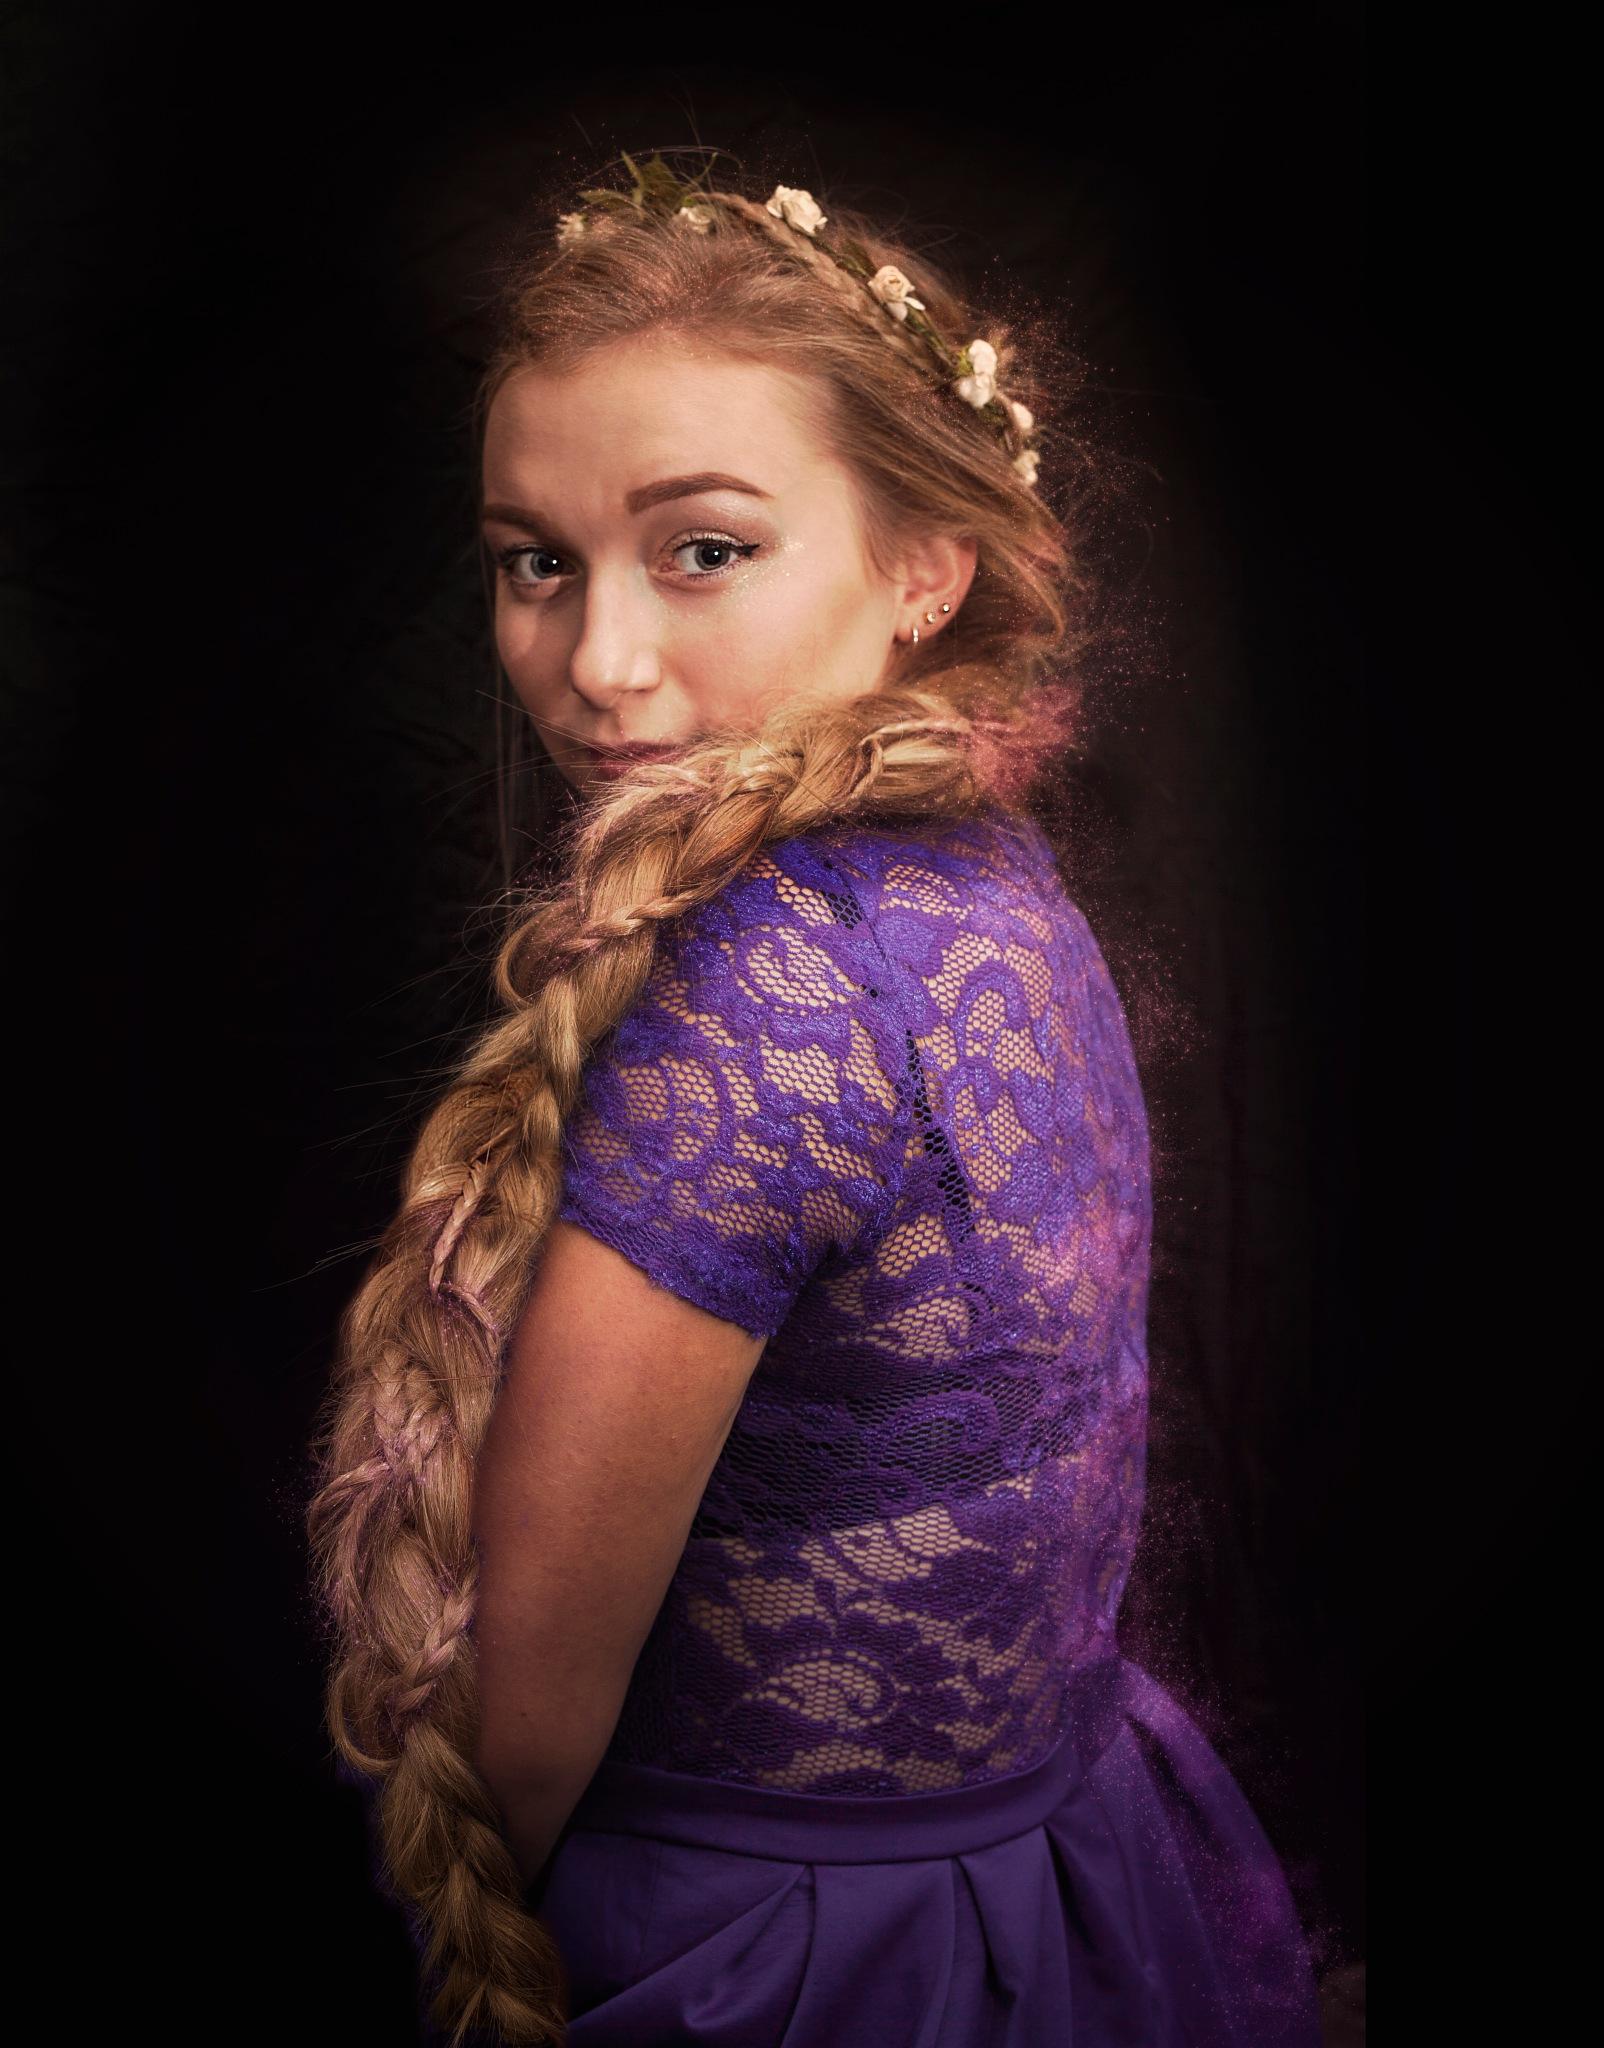 Rapunzel (part vi) by Rhii Photography